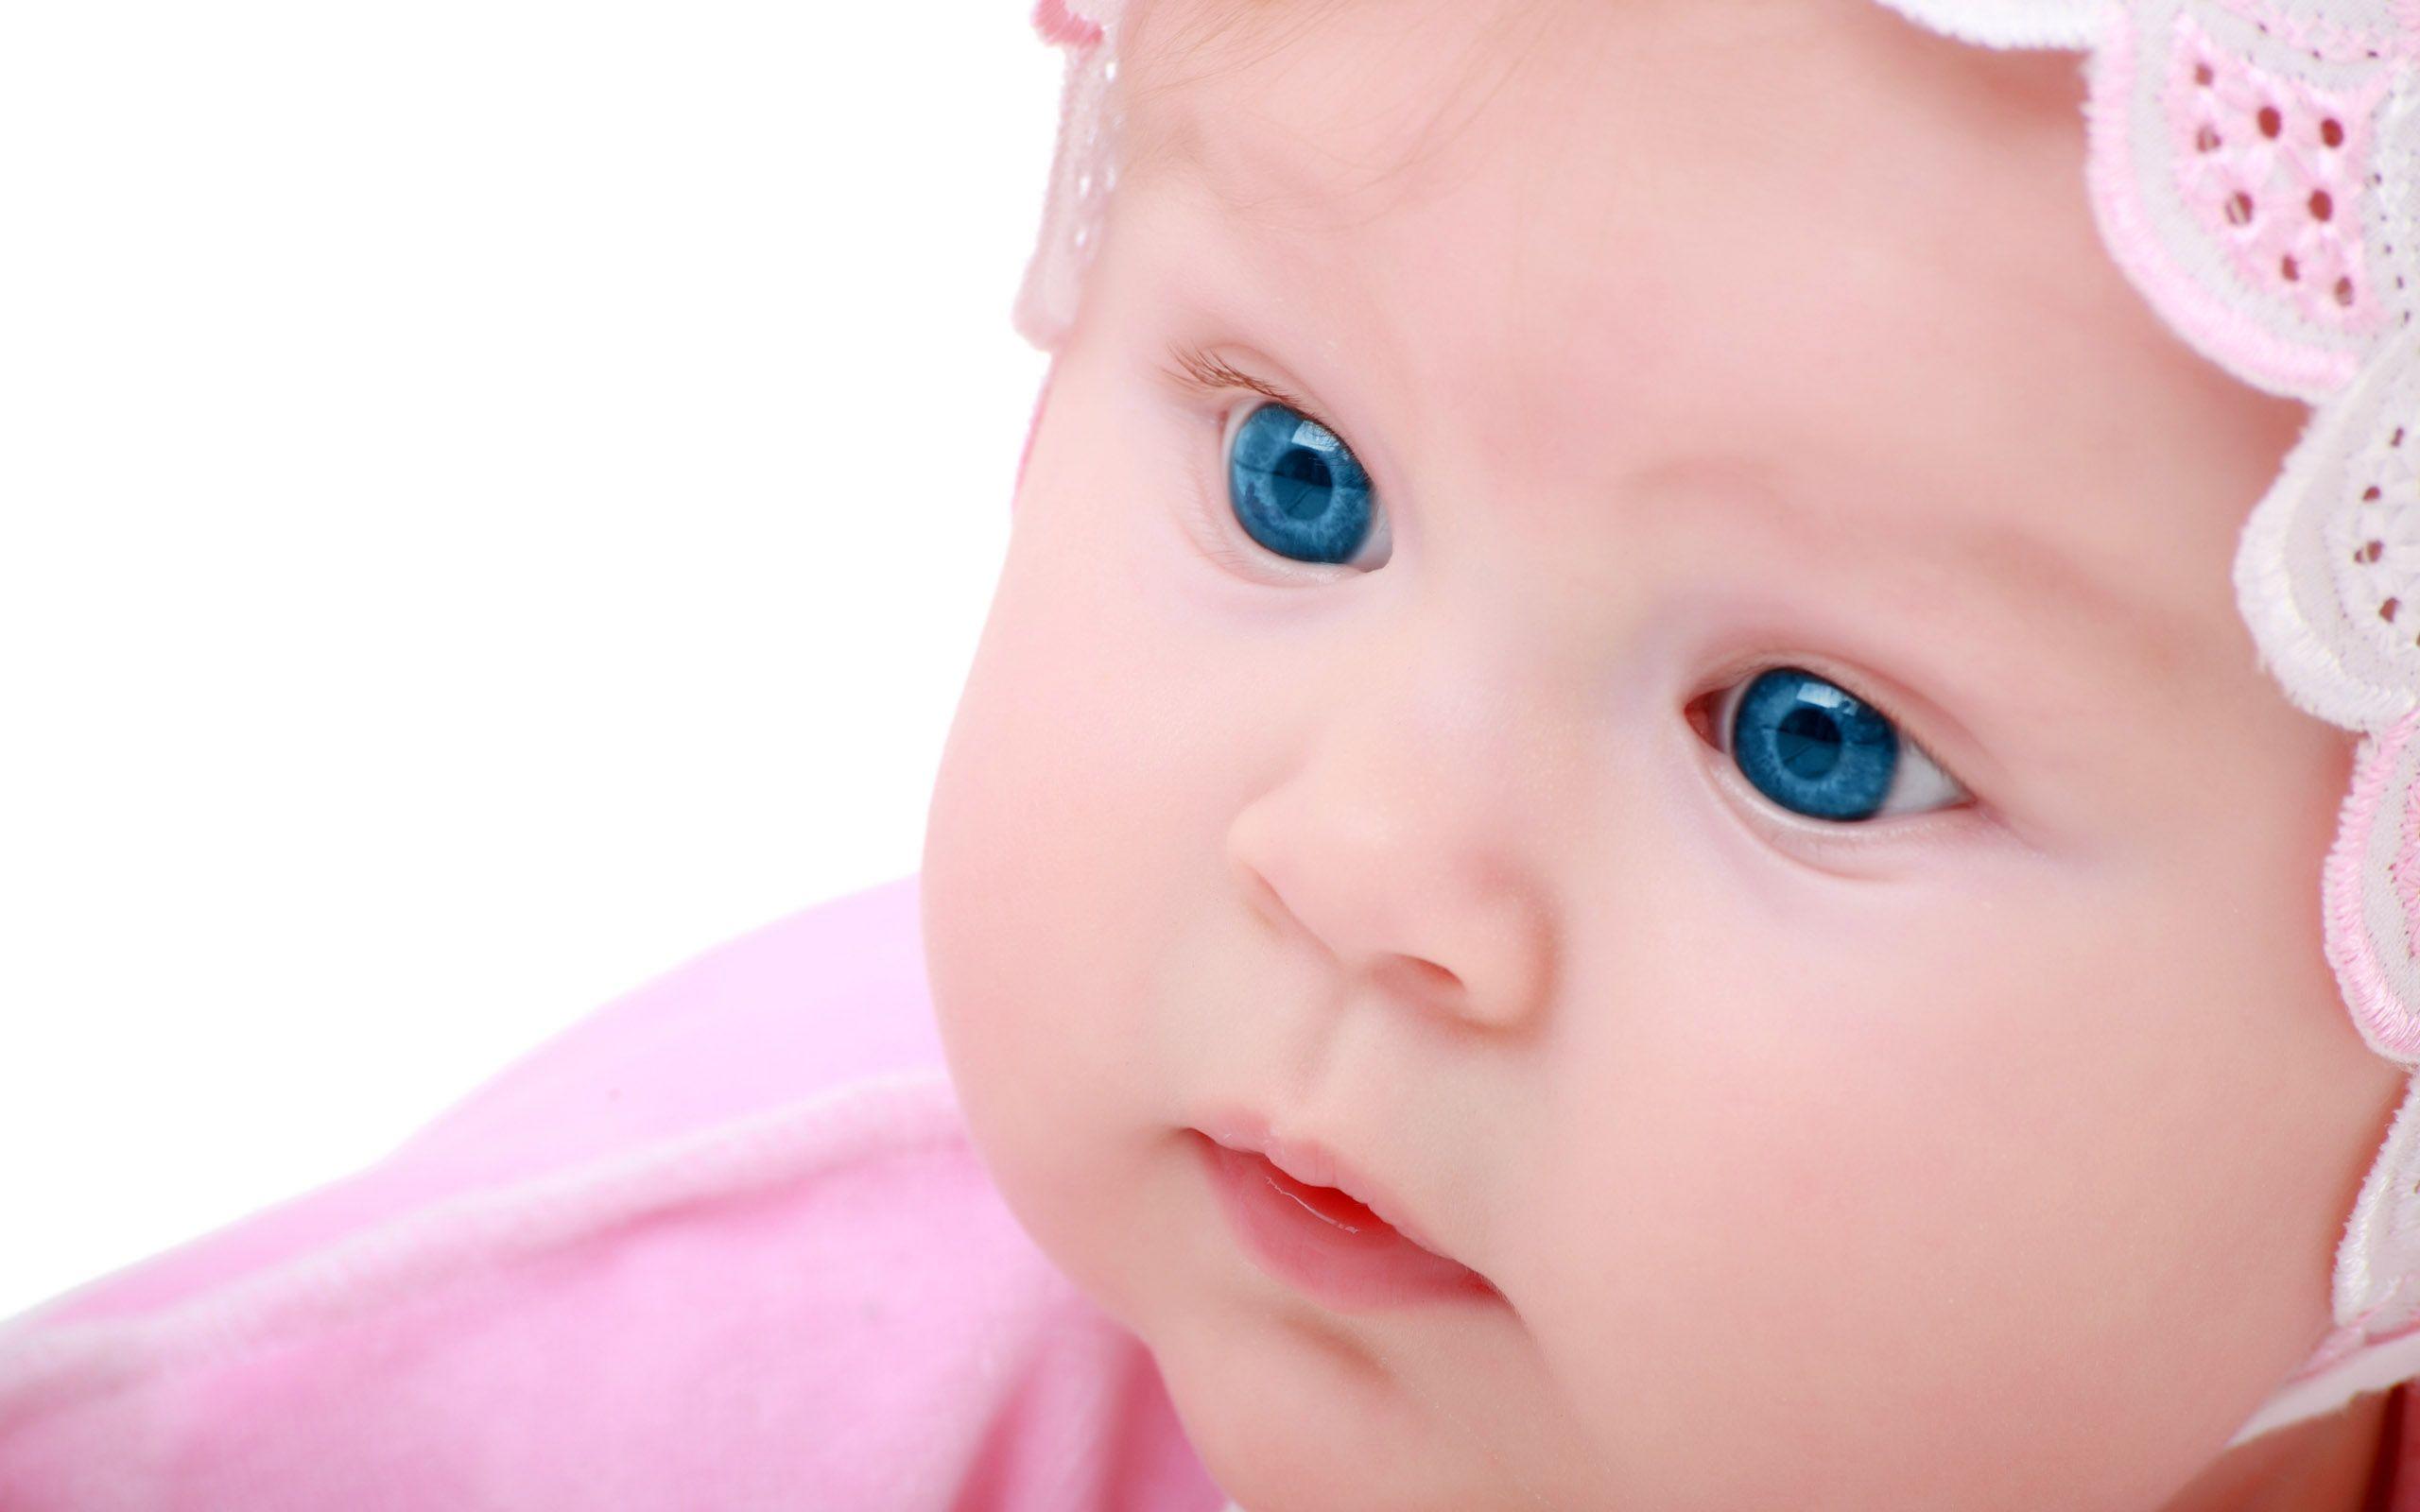 Porcelain Face Beautiful Blue Eyes Cute Baby Wallpaper Cute Baby Photos Cute Baby Shower Ideas